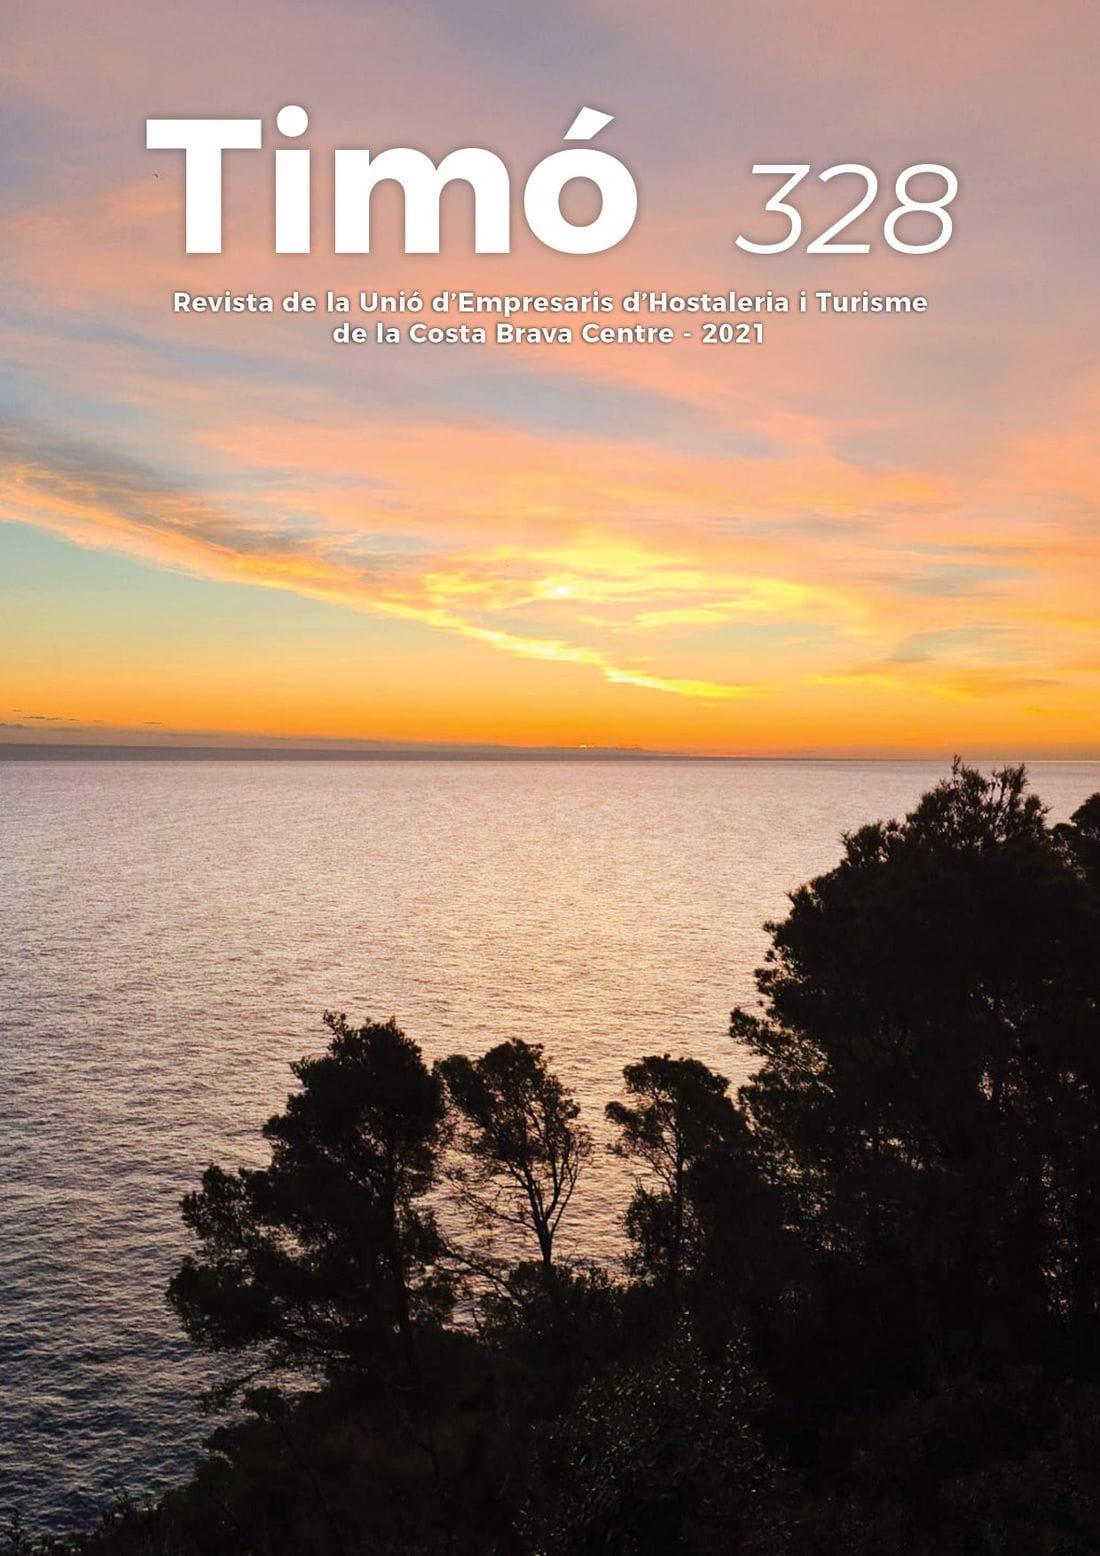 revista timo 328